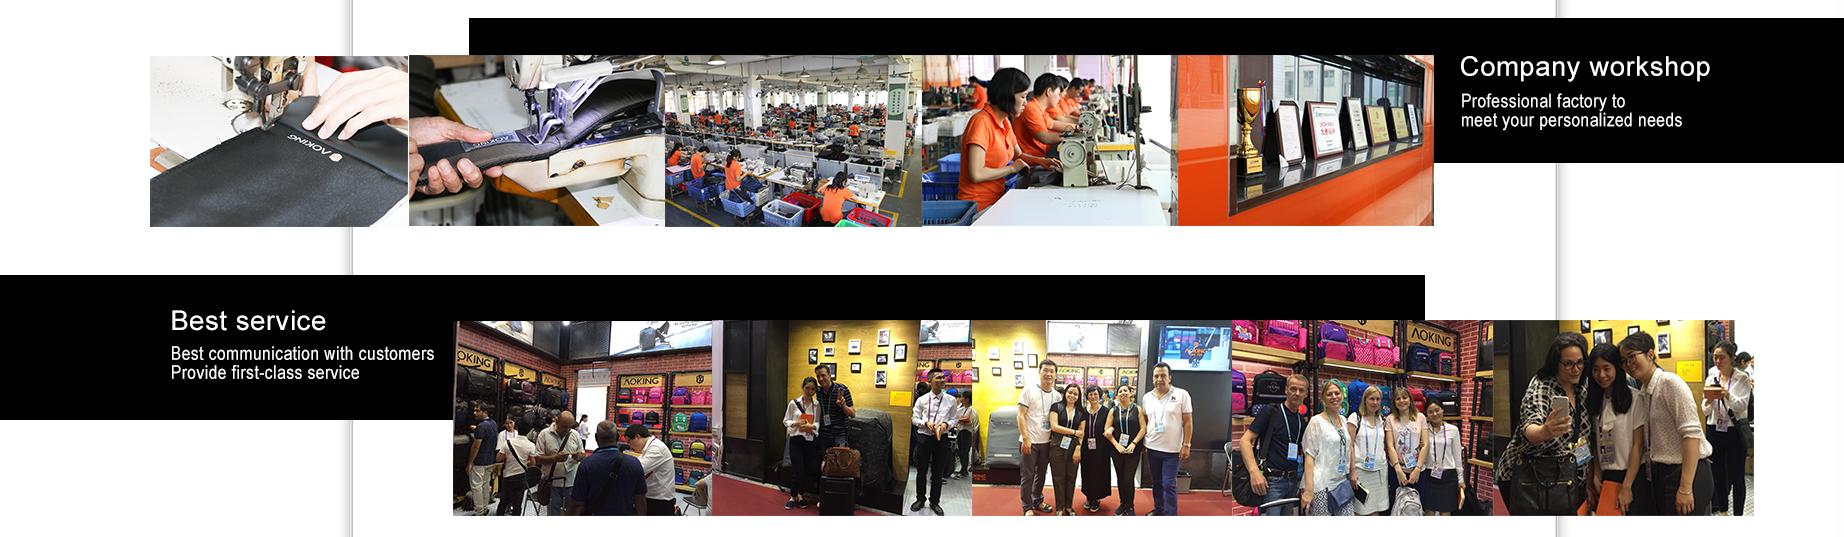 Guangzhou Aoking Leather Co Ltd Business Backpack Casual Tas Ransel Sekolah Anak Mediummsofie Pink 1 Piecemin Order